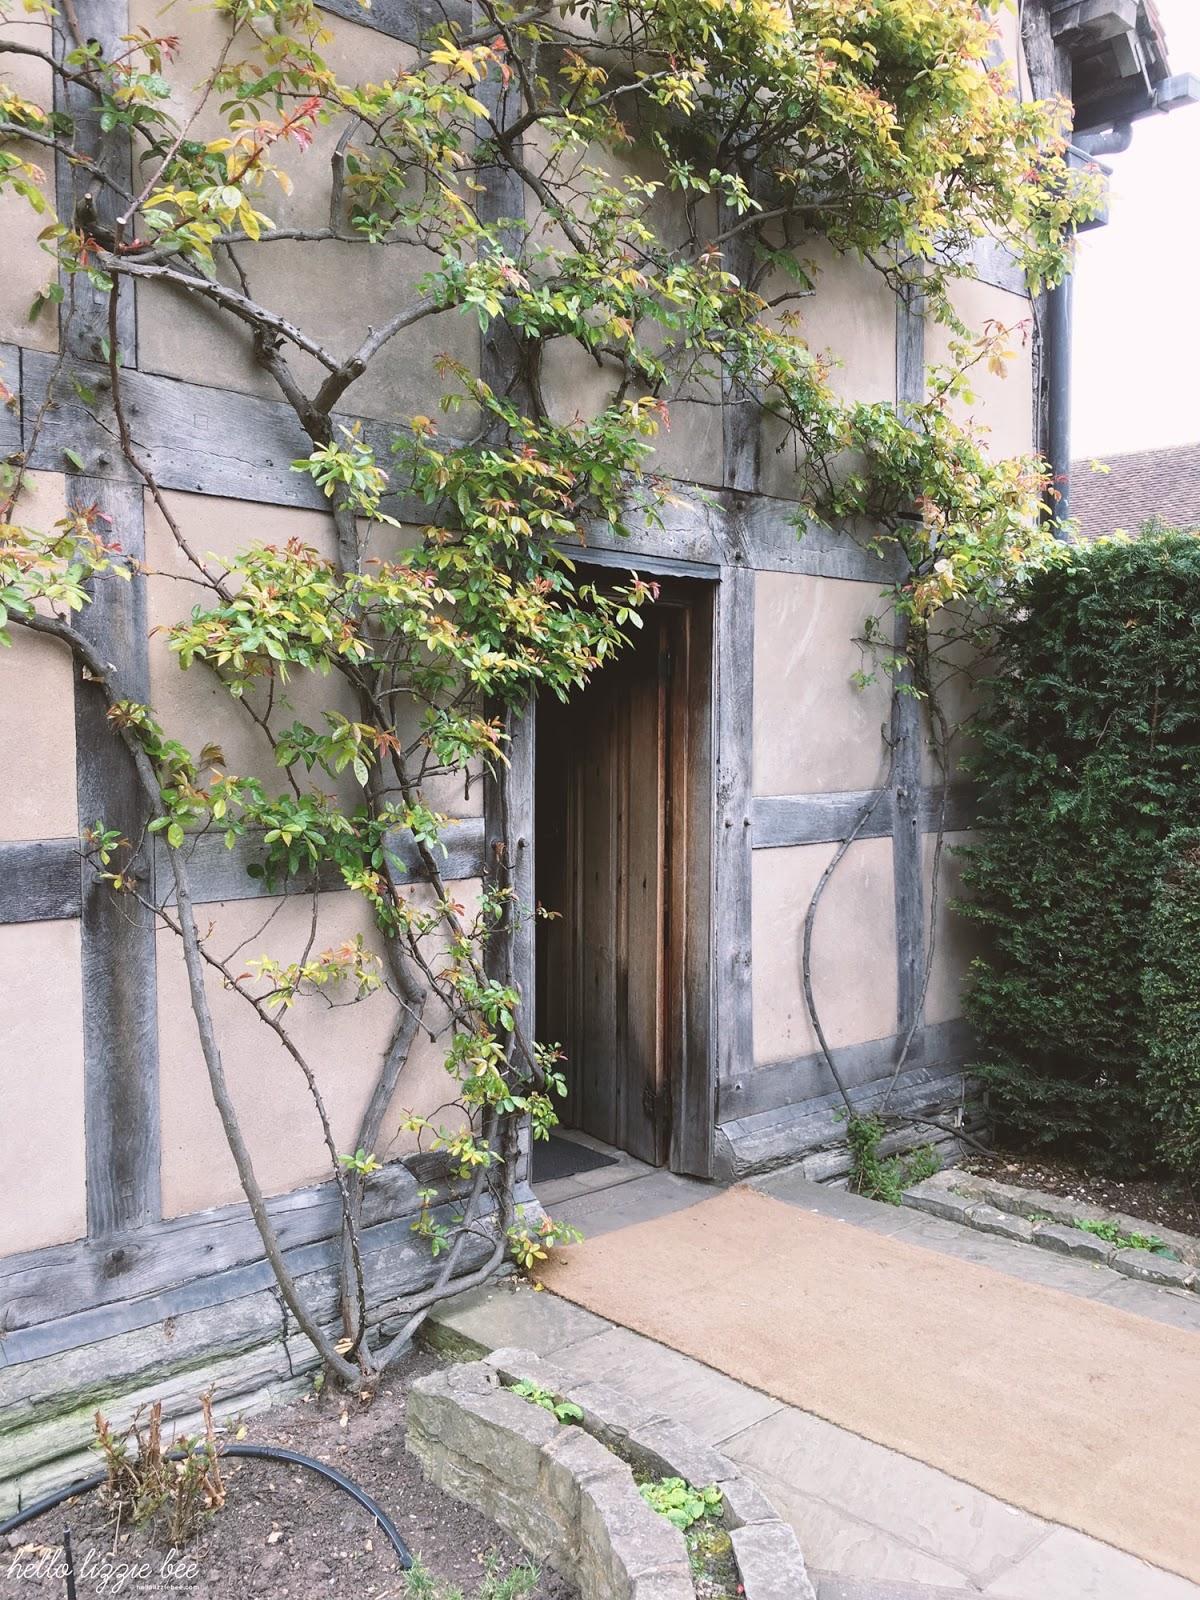 shakespeare's house, stratford